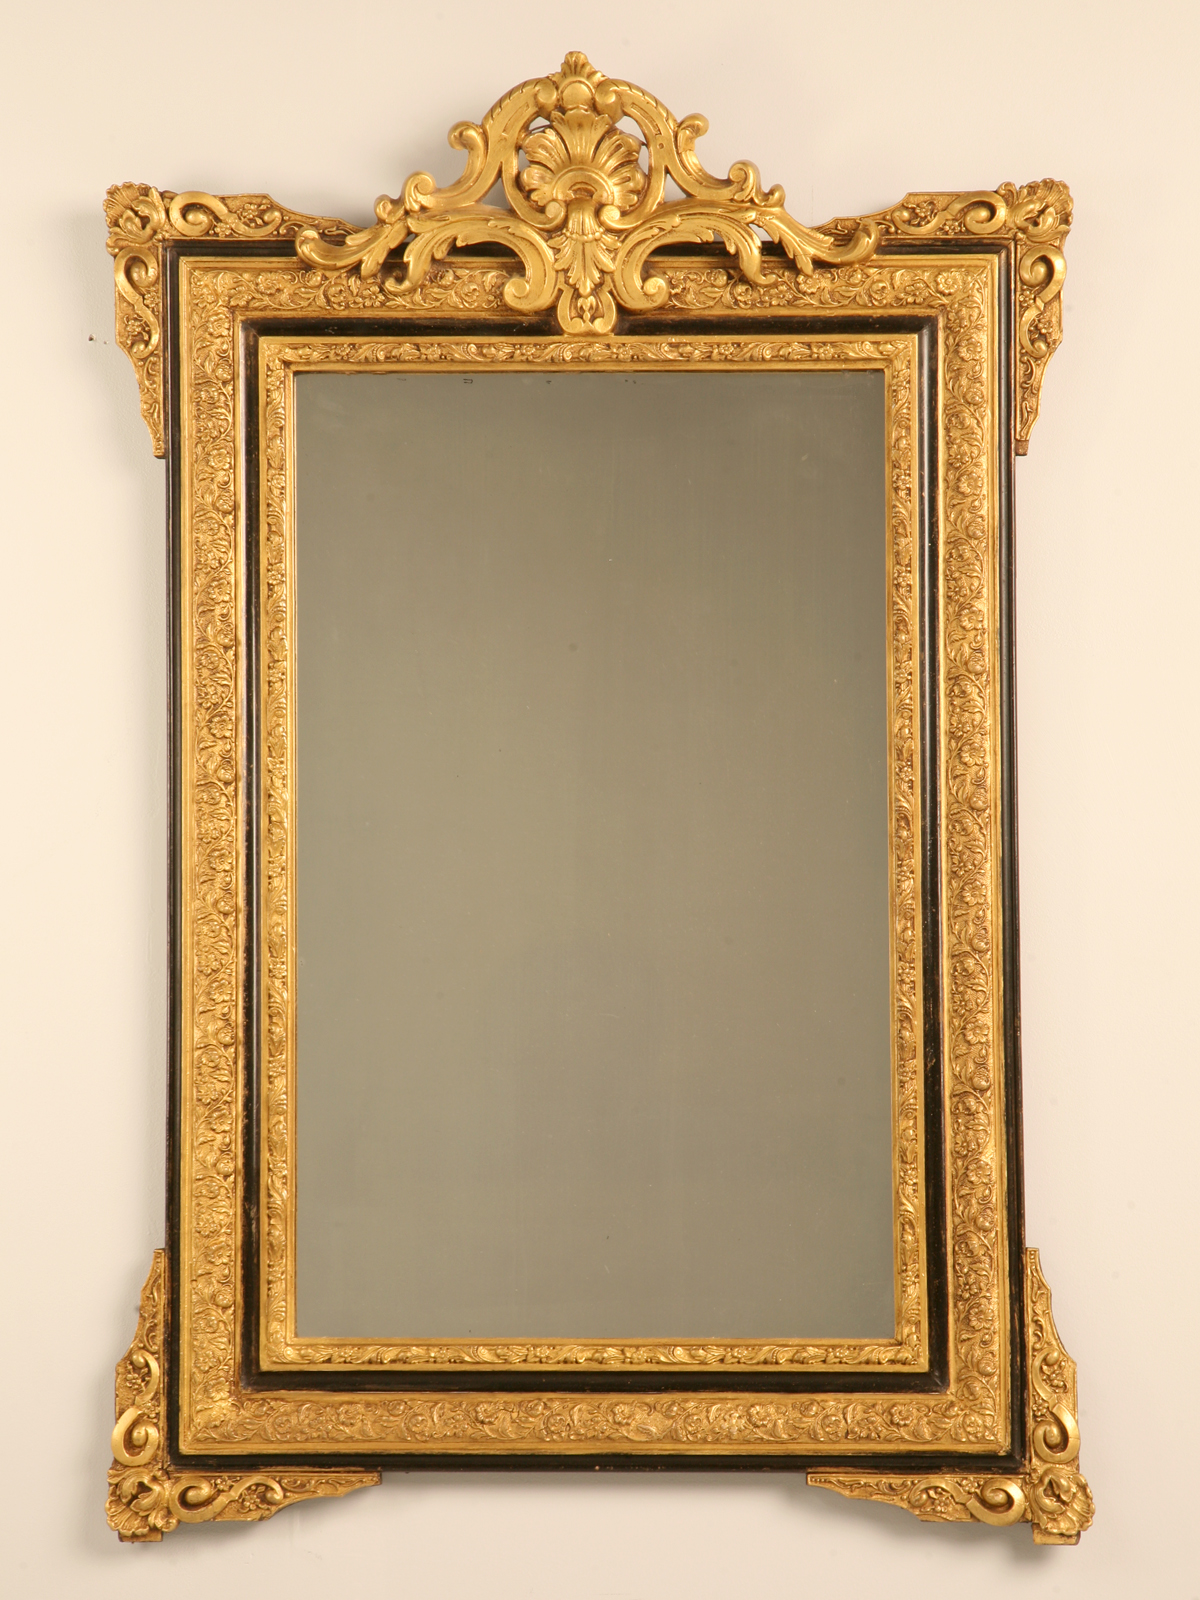 40+ Antique Mirror Wallpaper on WallpaperSafari